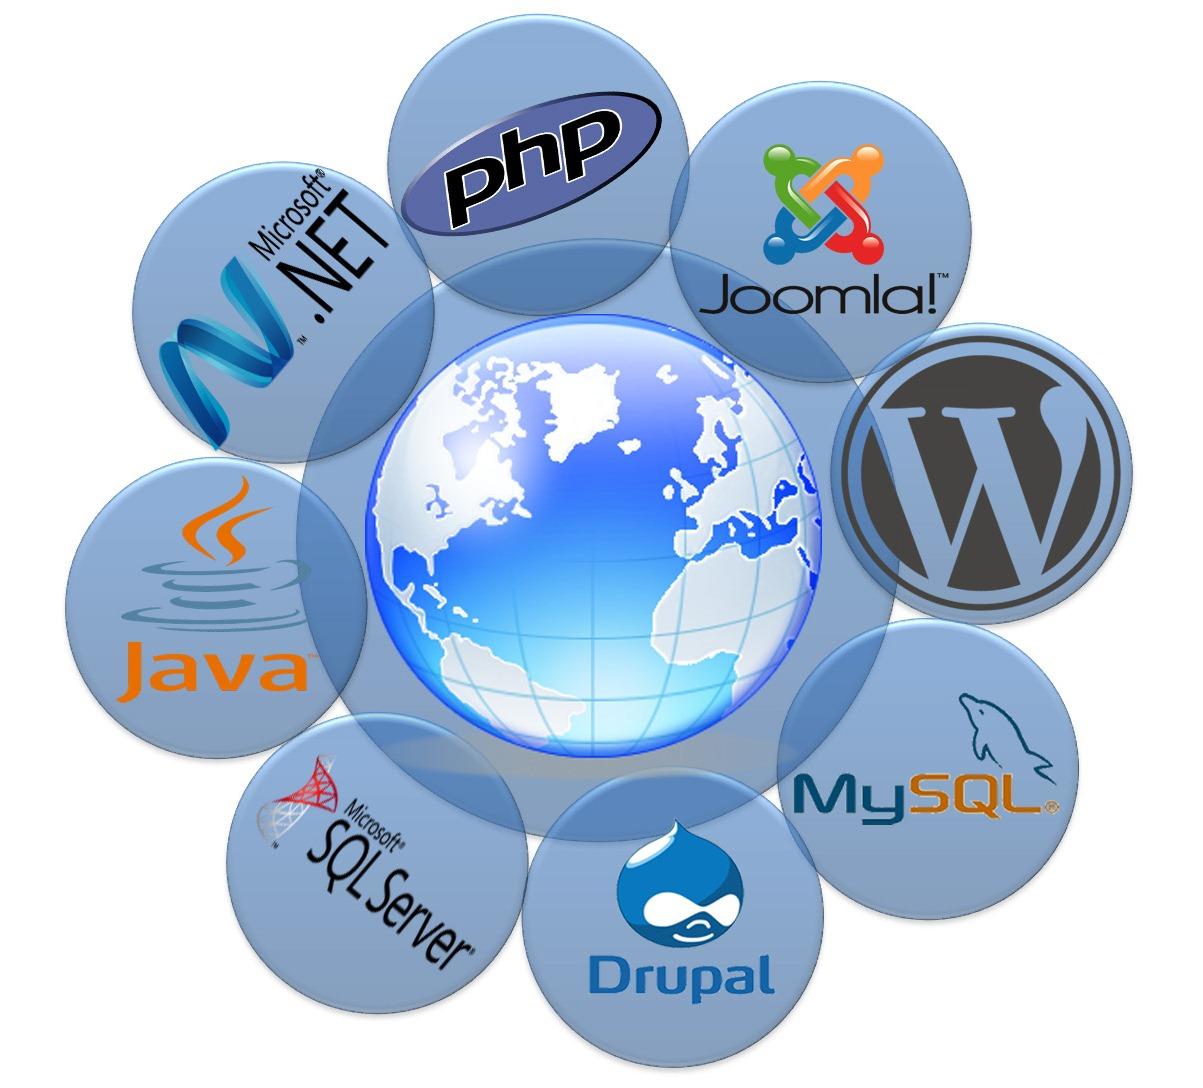 WEB DEVELOPMENT AND DESIGNING